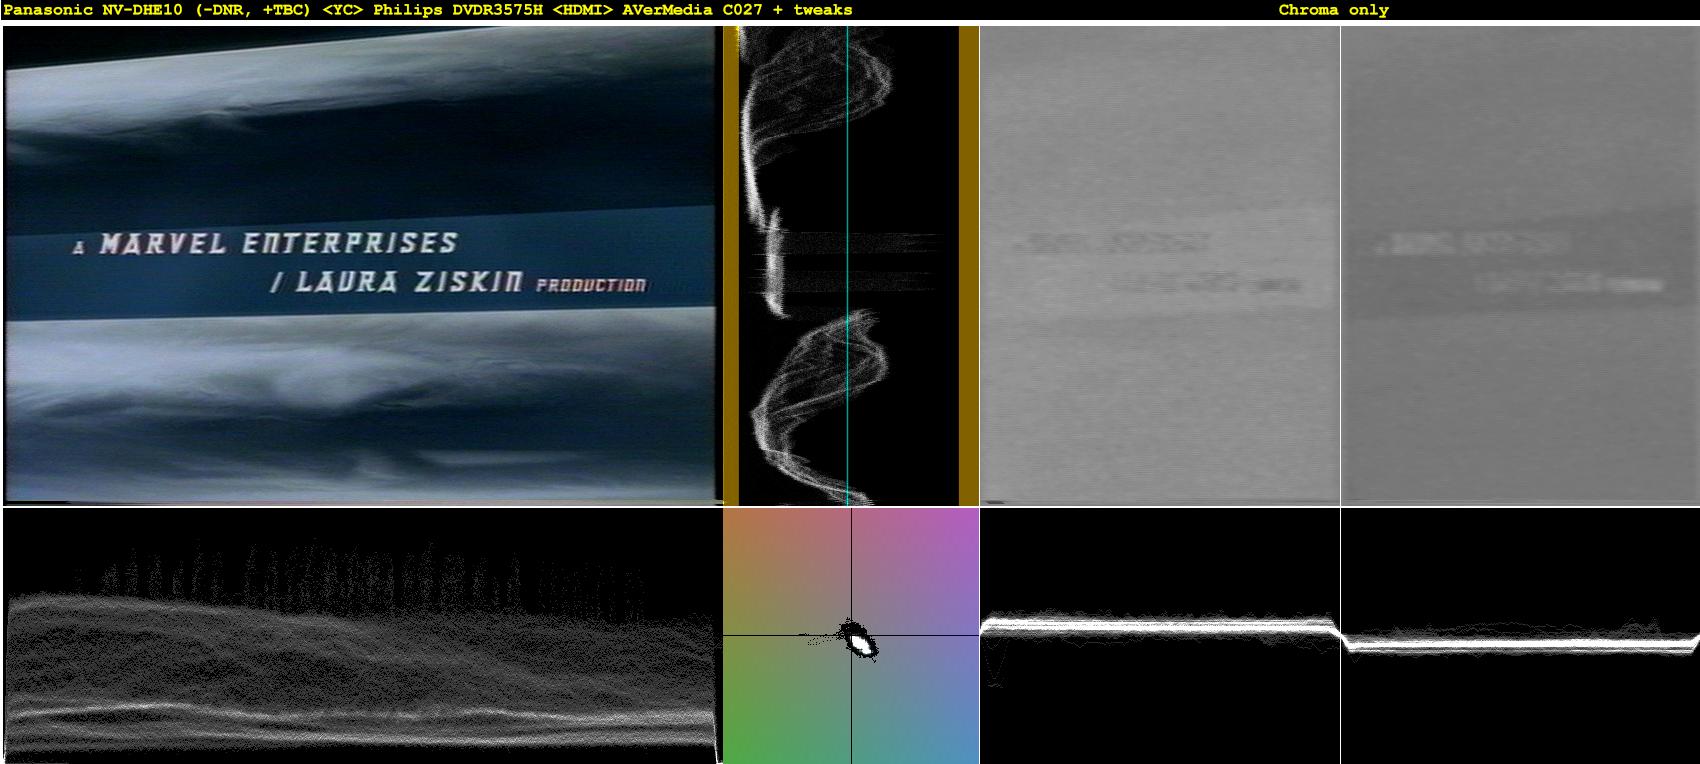 Click image for larger version  Name:0-09-01 - Panasonic NV-DHE10 (-DNR, +TBC).png Views:1103 Size:947.2 KB ID:37992